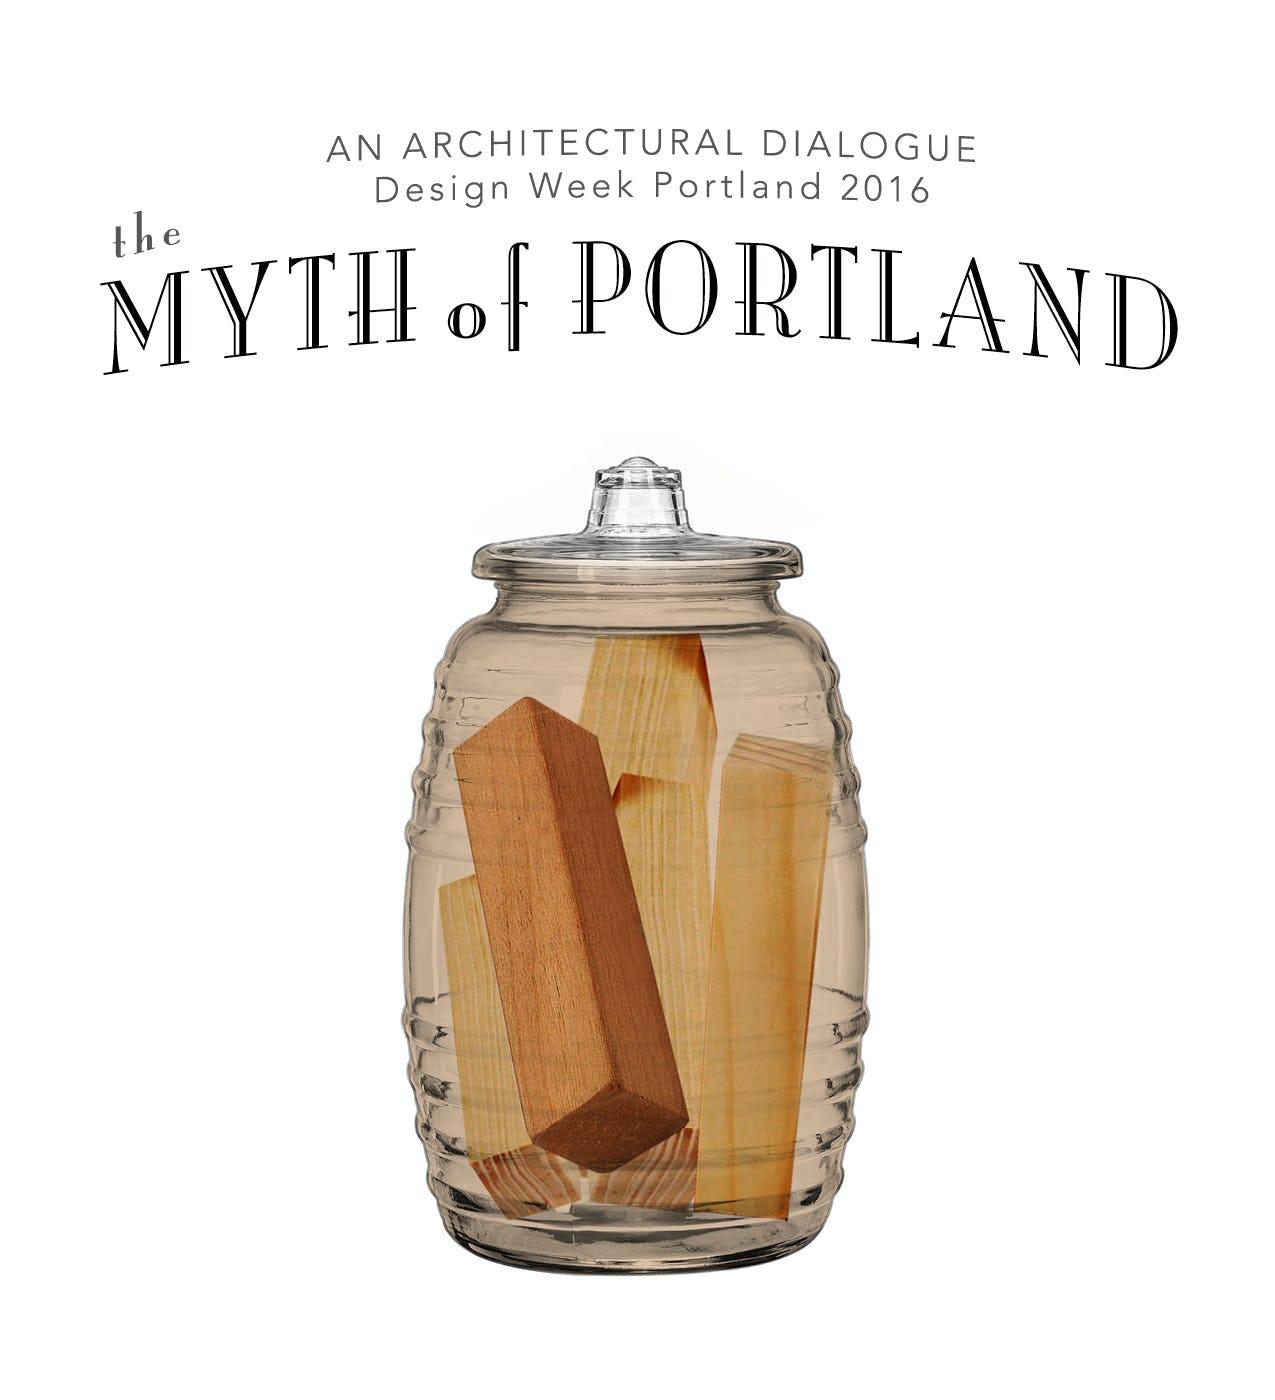 The myth of portland